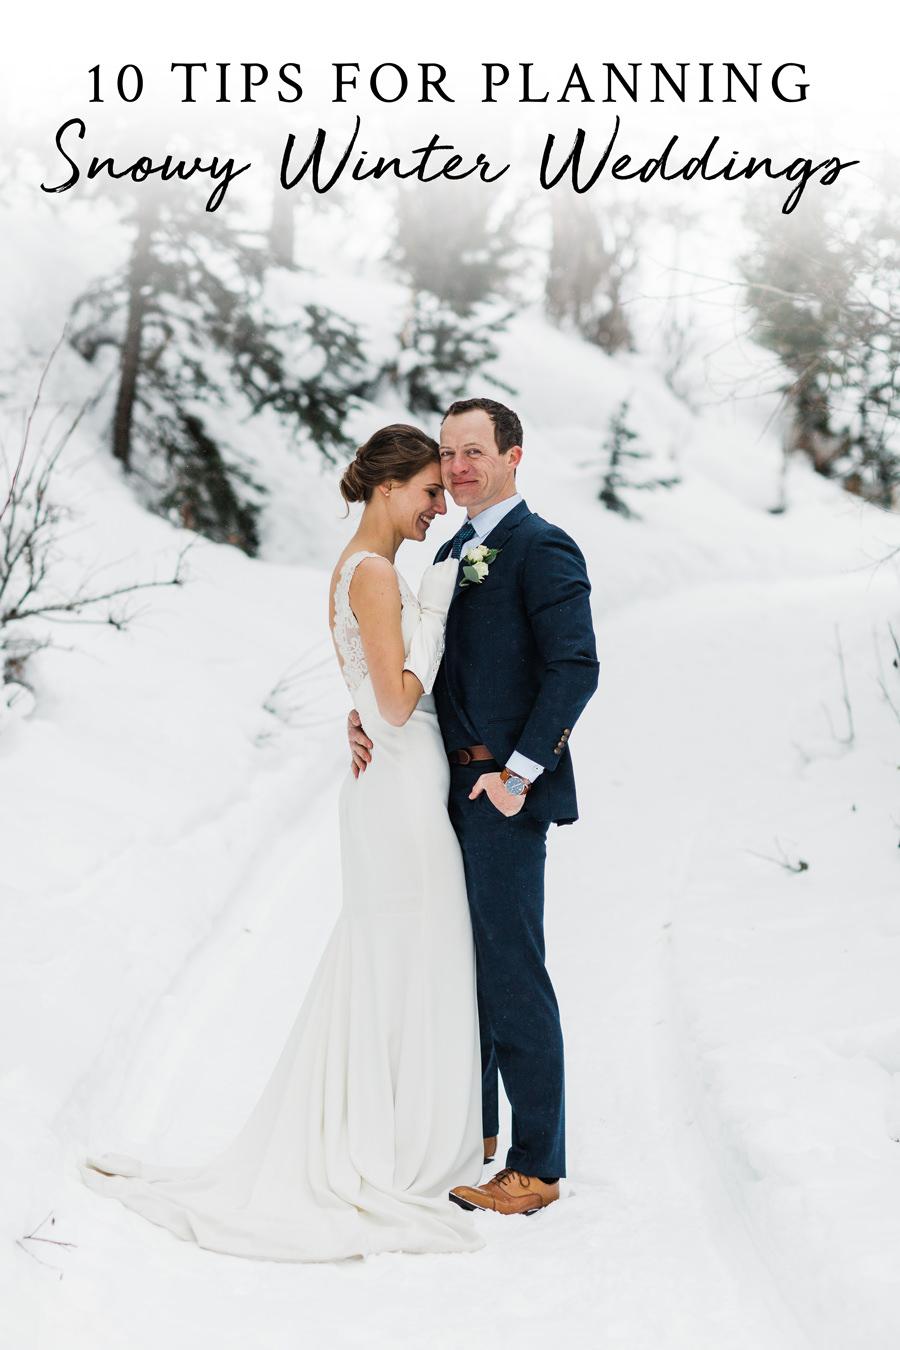 How to Plan a Winter Wedding by Adventure Wedding Photographer Amy Galbraith